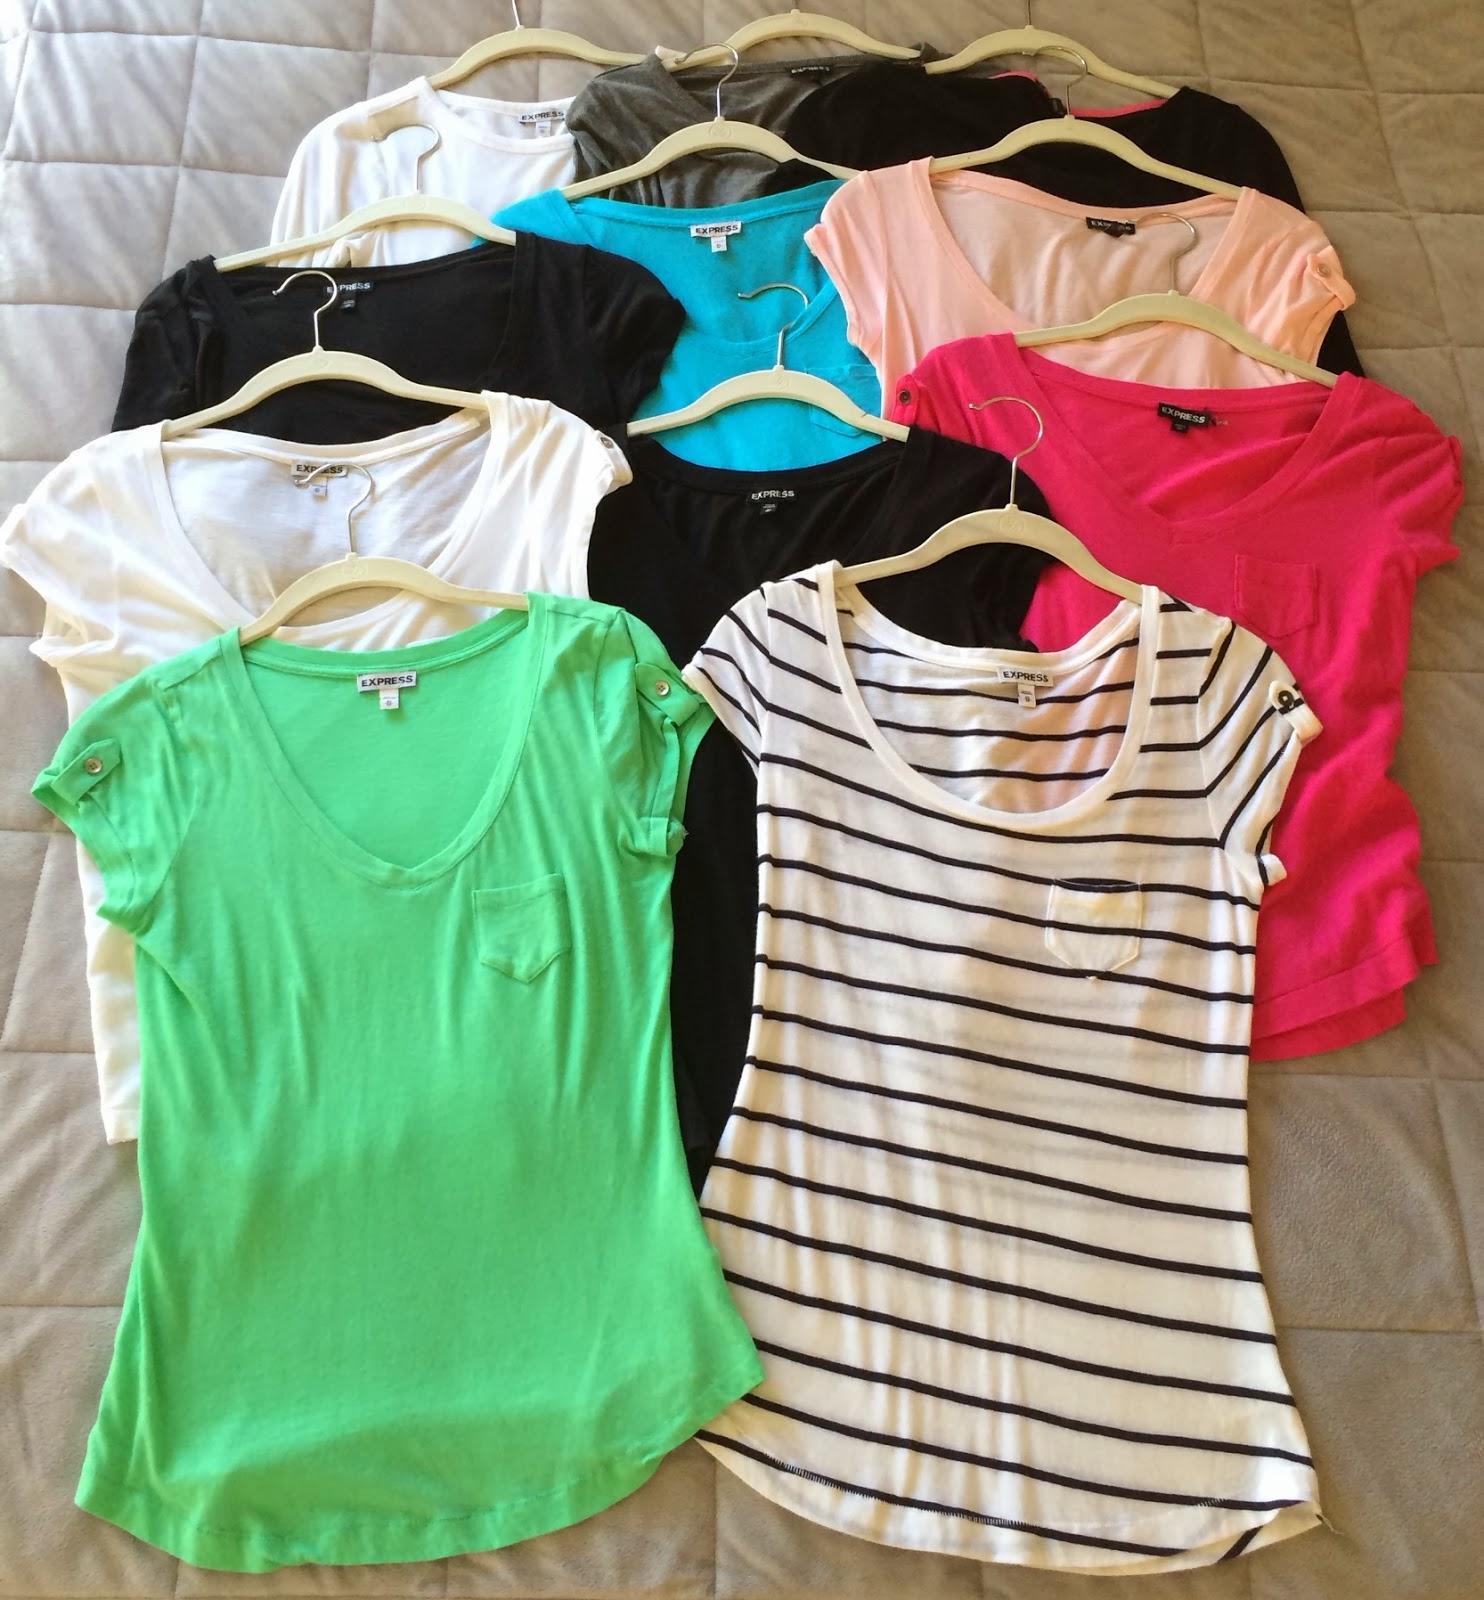 Express t shirt, shirttail hem, 3/4 length sleeve, scoop neck, v neck, bateau neck, short sleeve, long sleeve, tab shoulder, zip shoulder, button shoulder